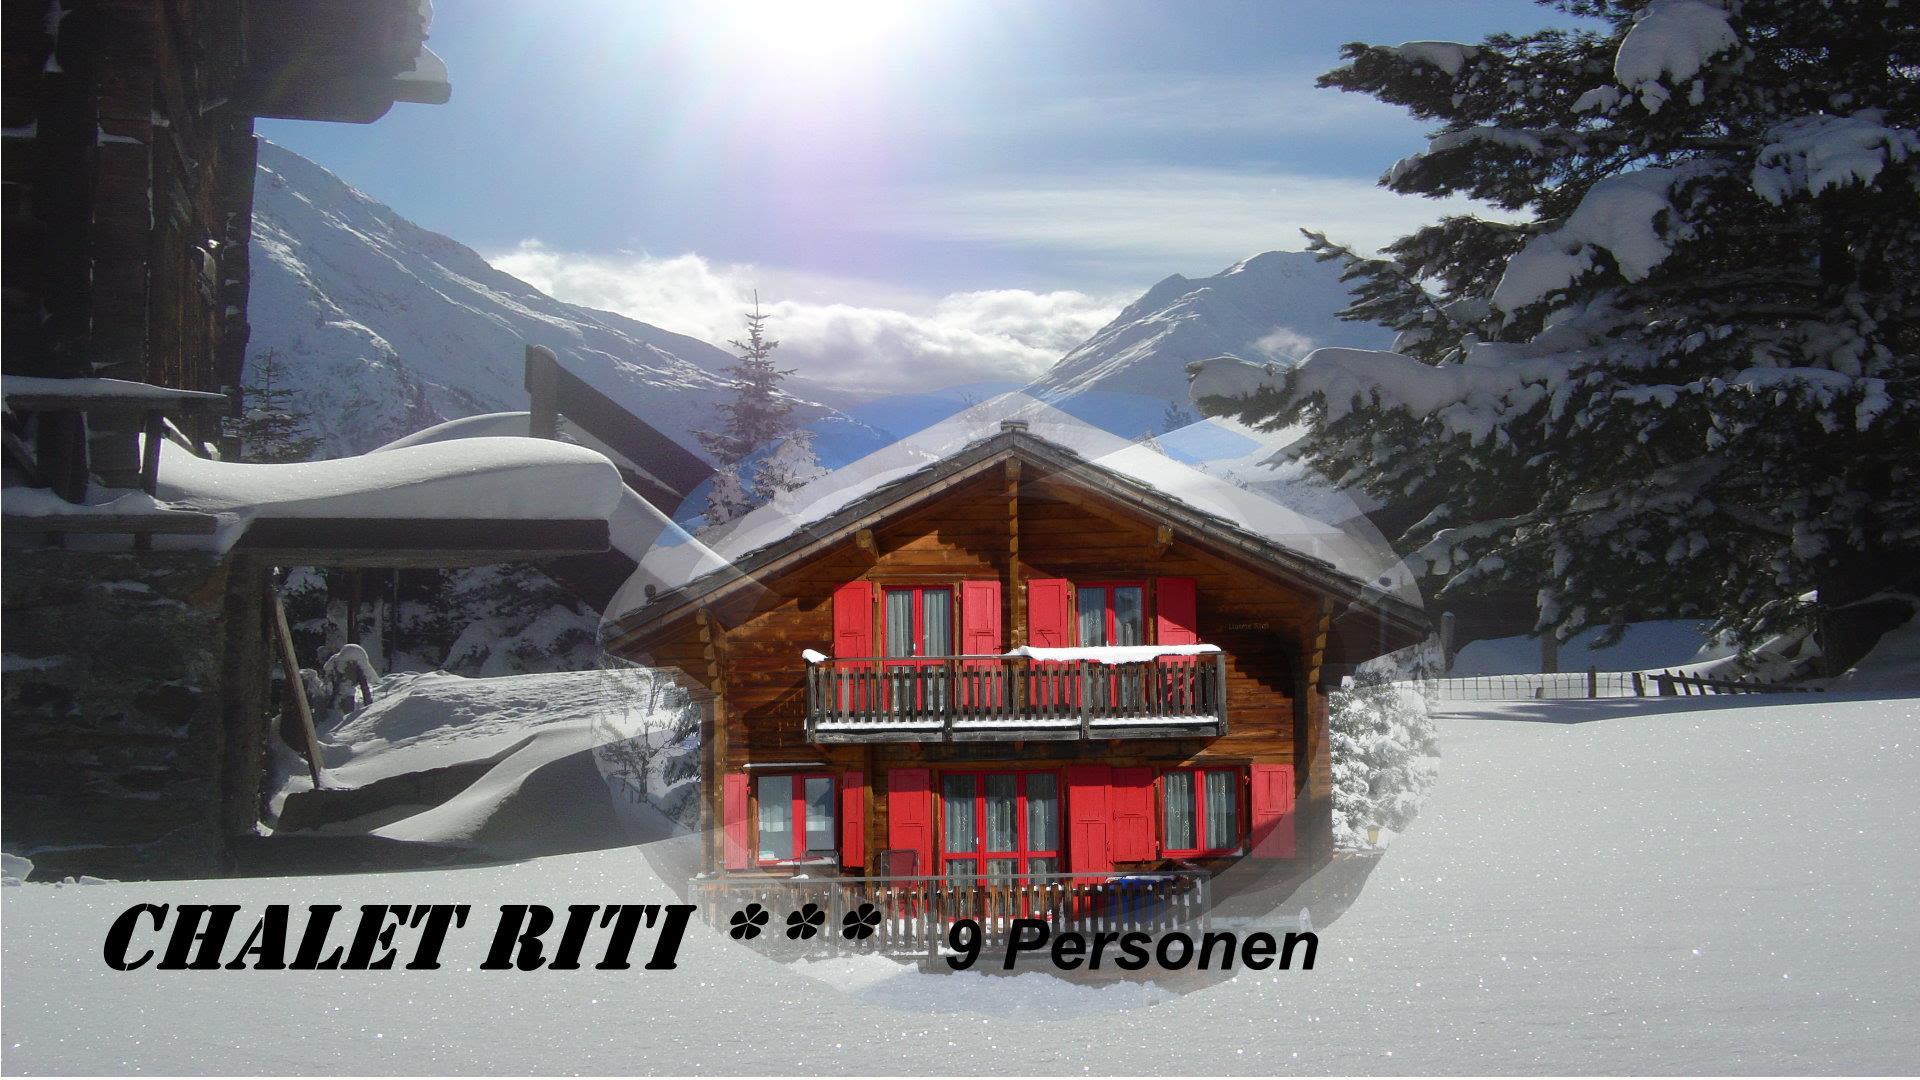 0.1 Chalet Riti Frontbild Winter